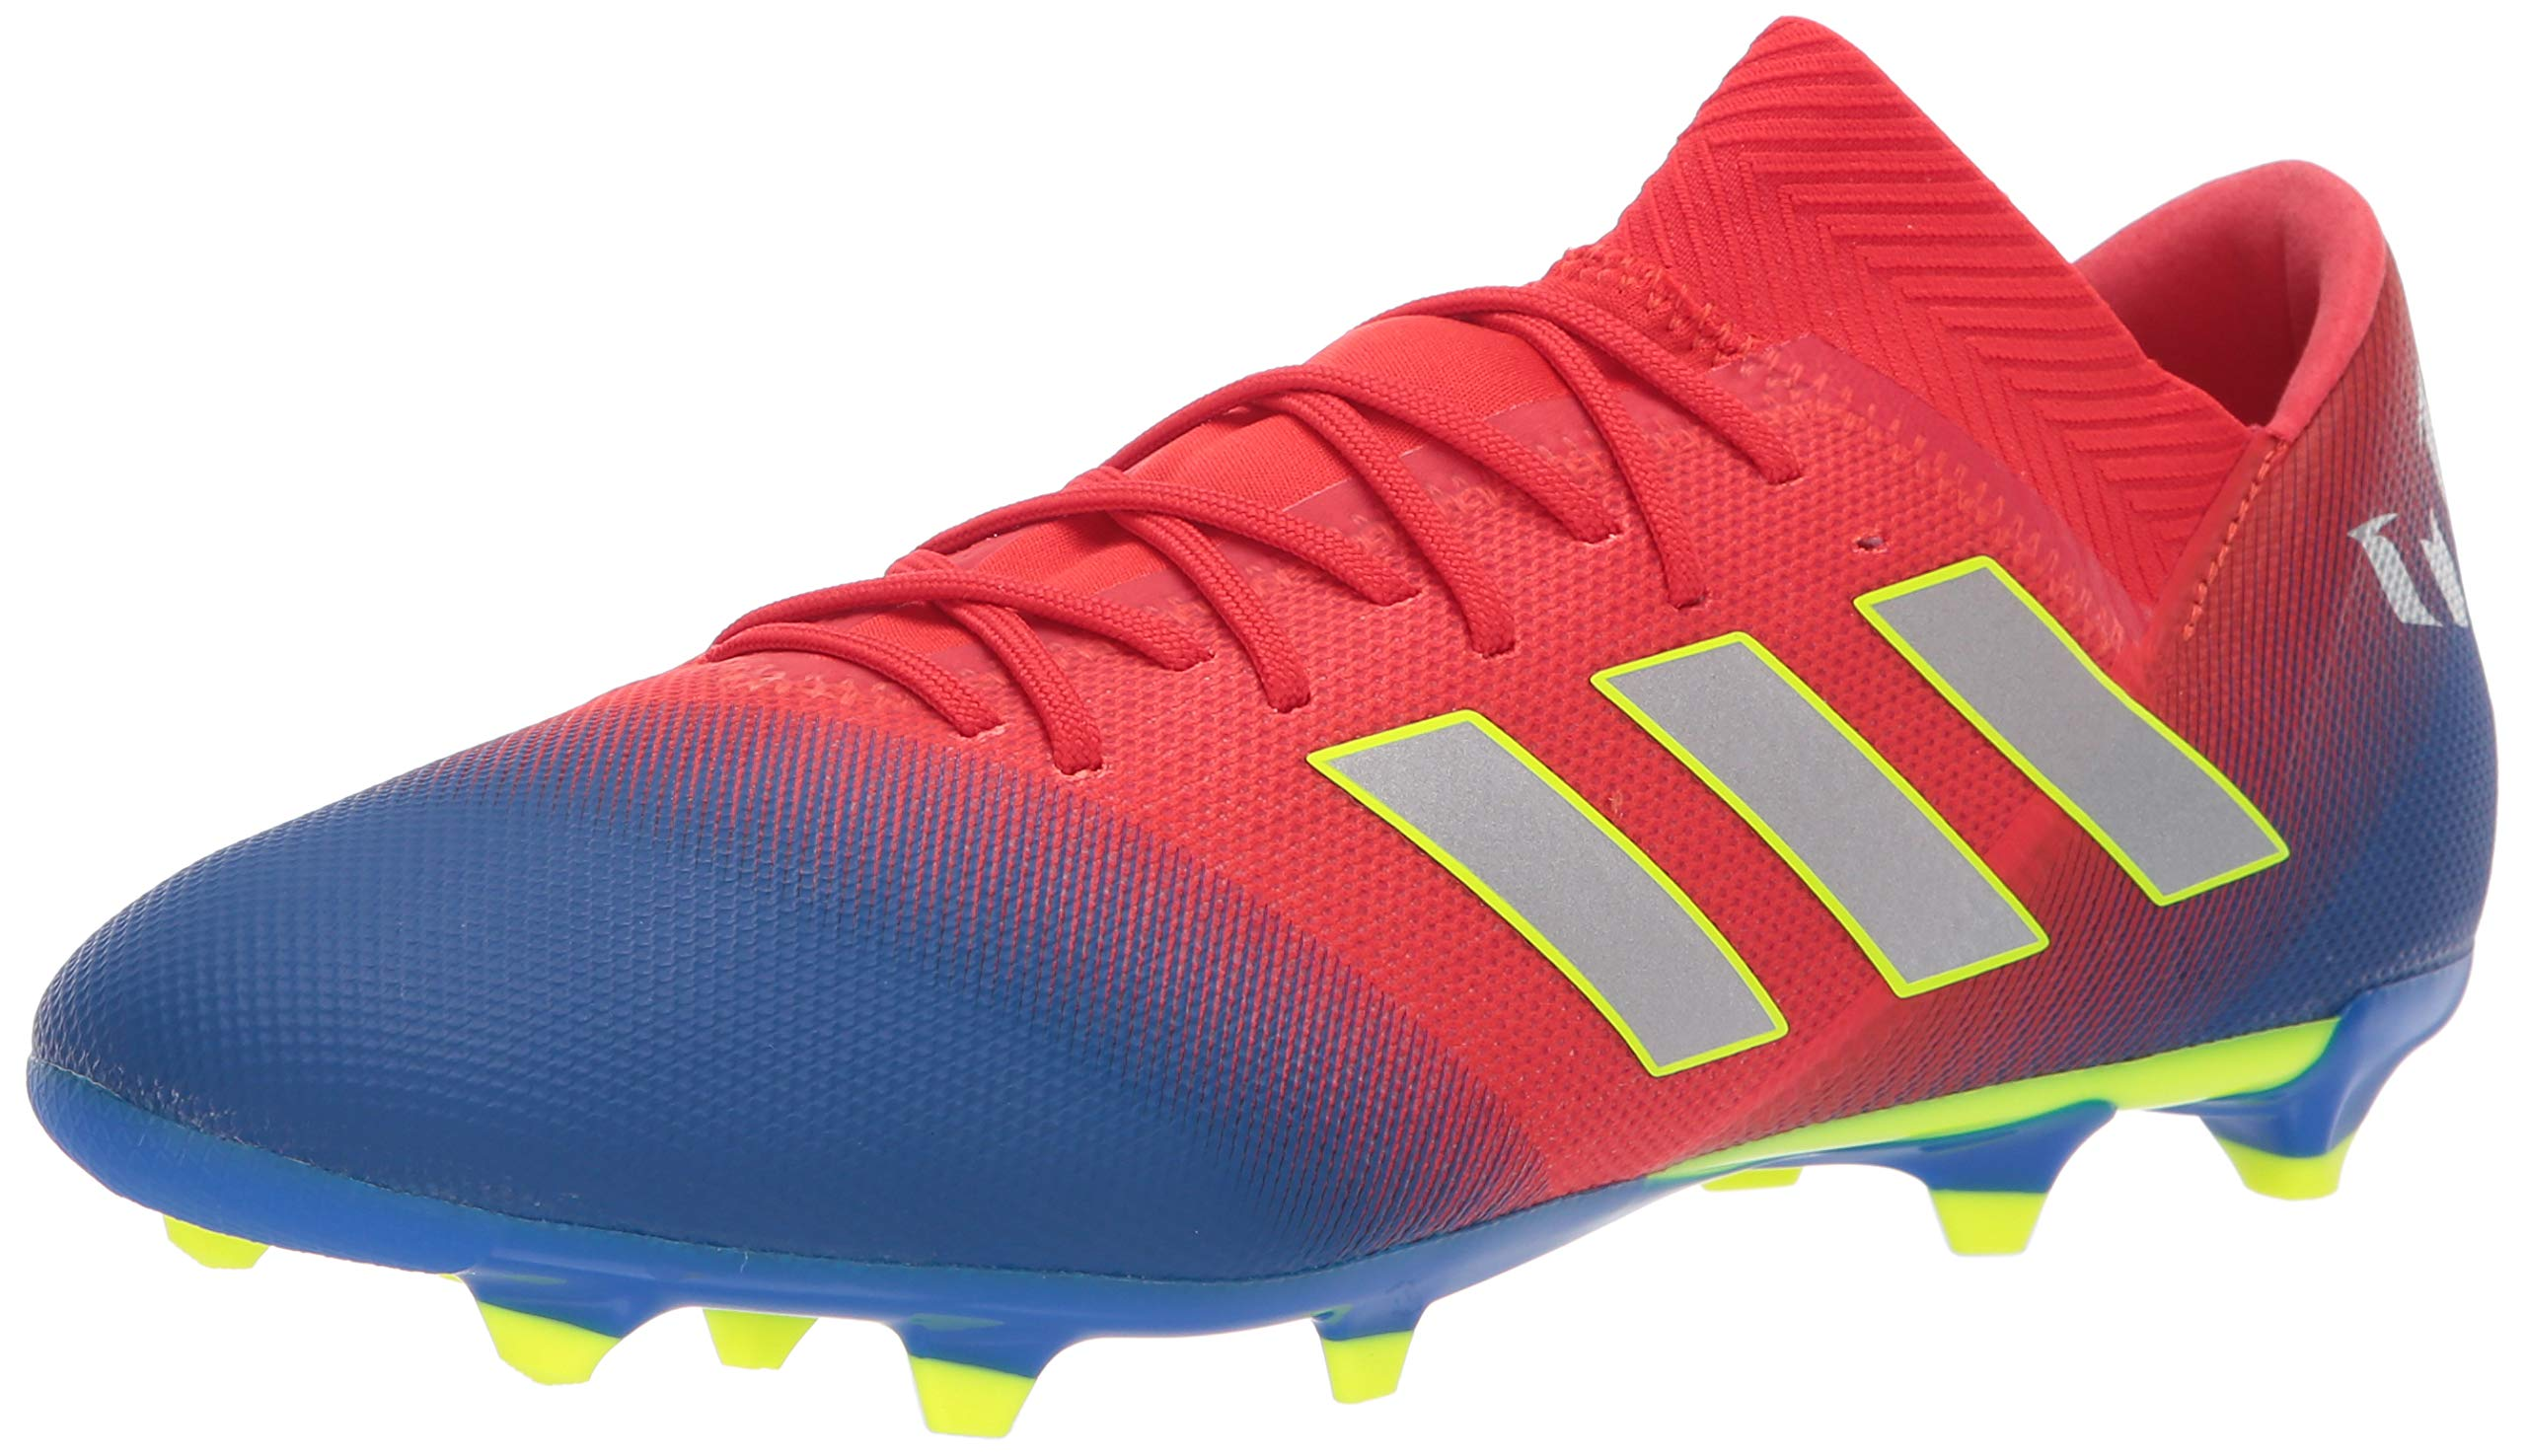 adidas Men's Nemeziz Messi 18.3 Firm Ground, Active red/Silver Metallic/Football Blue, 6.5 M US